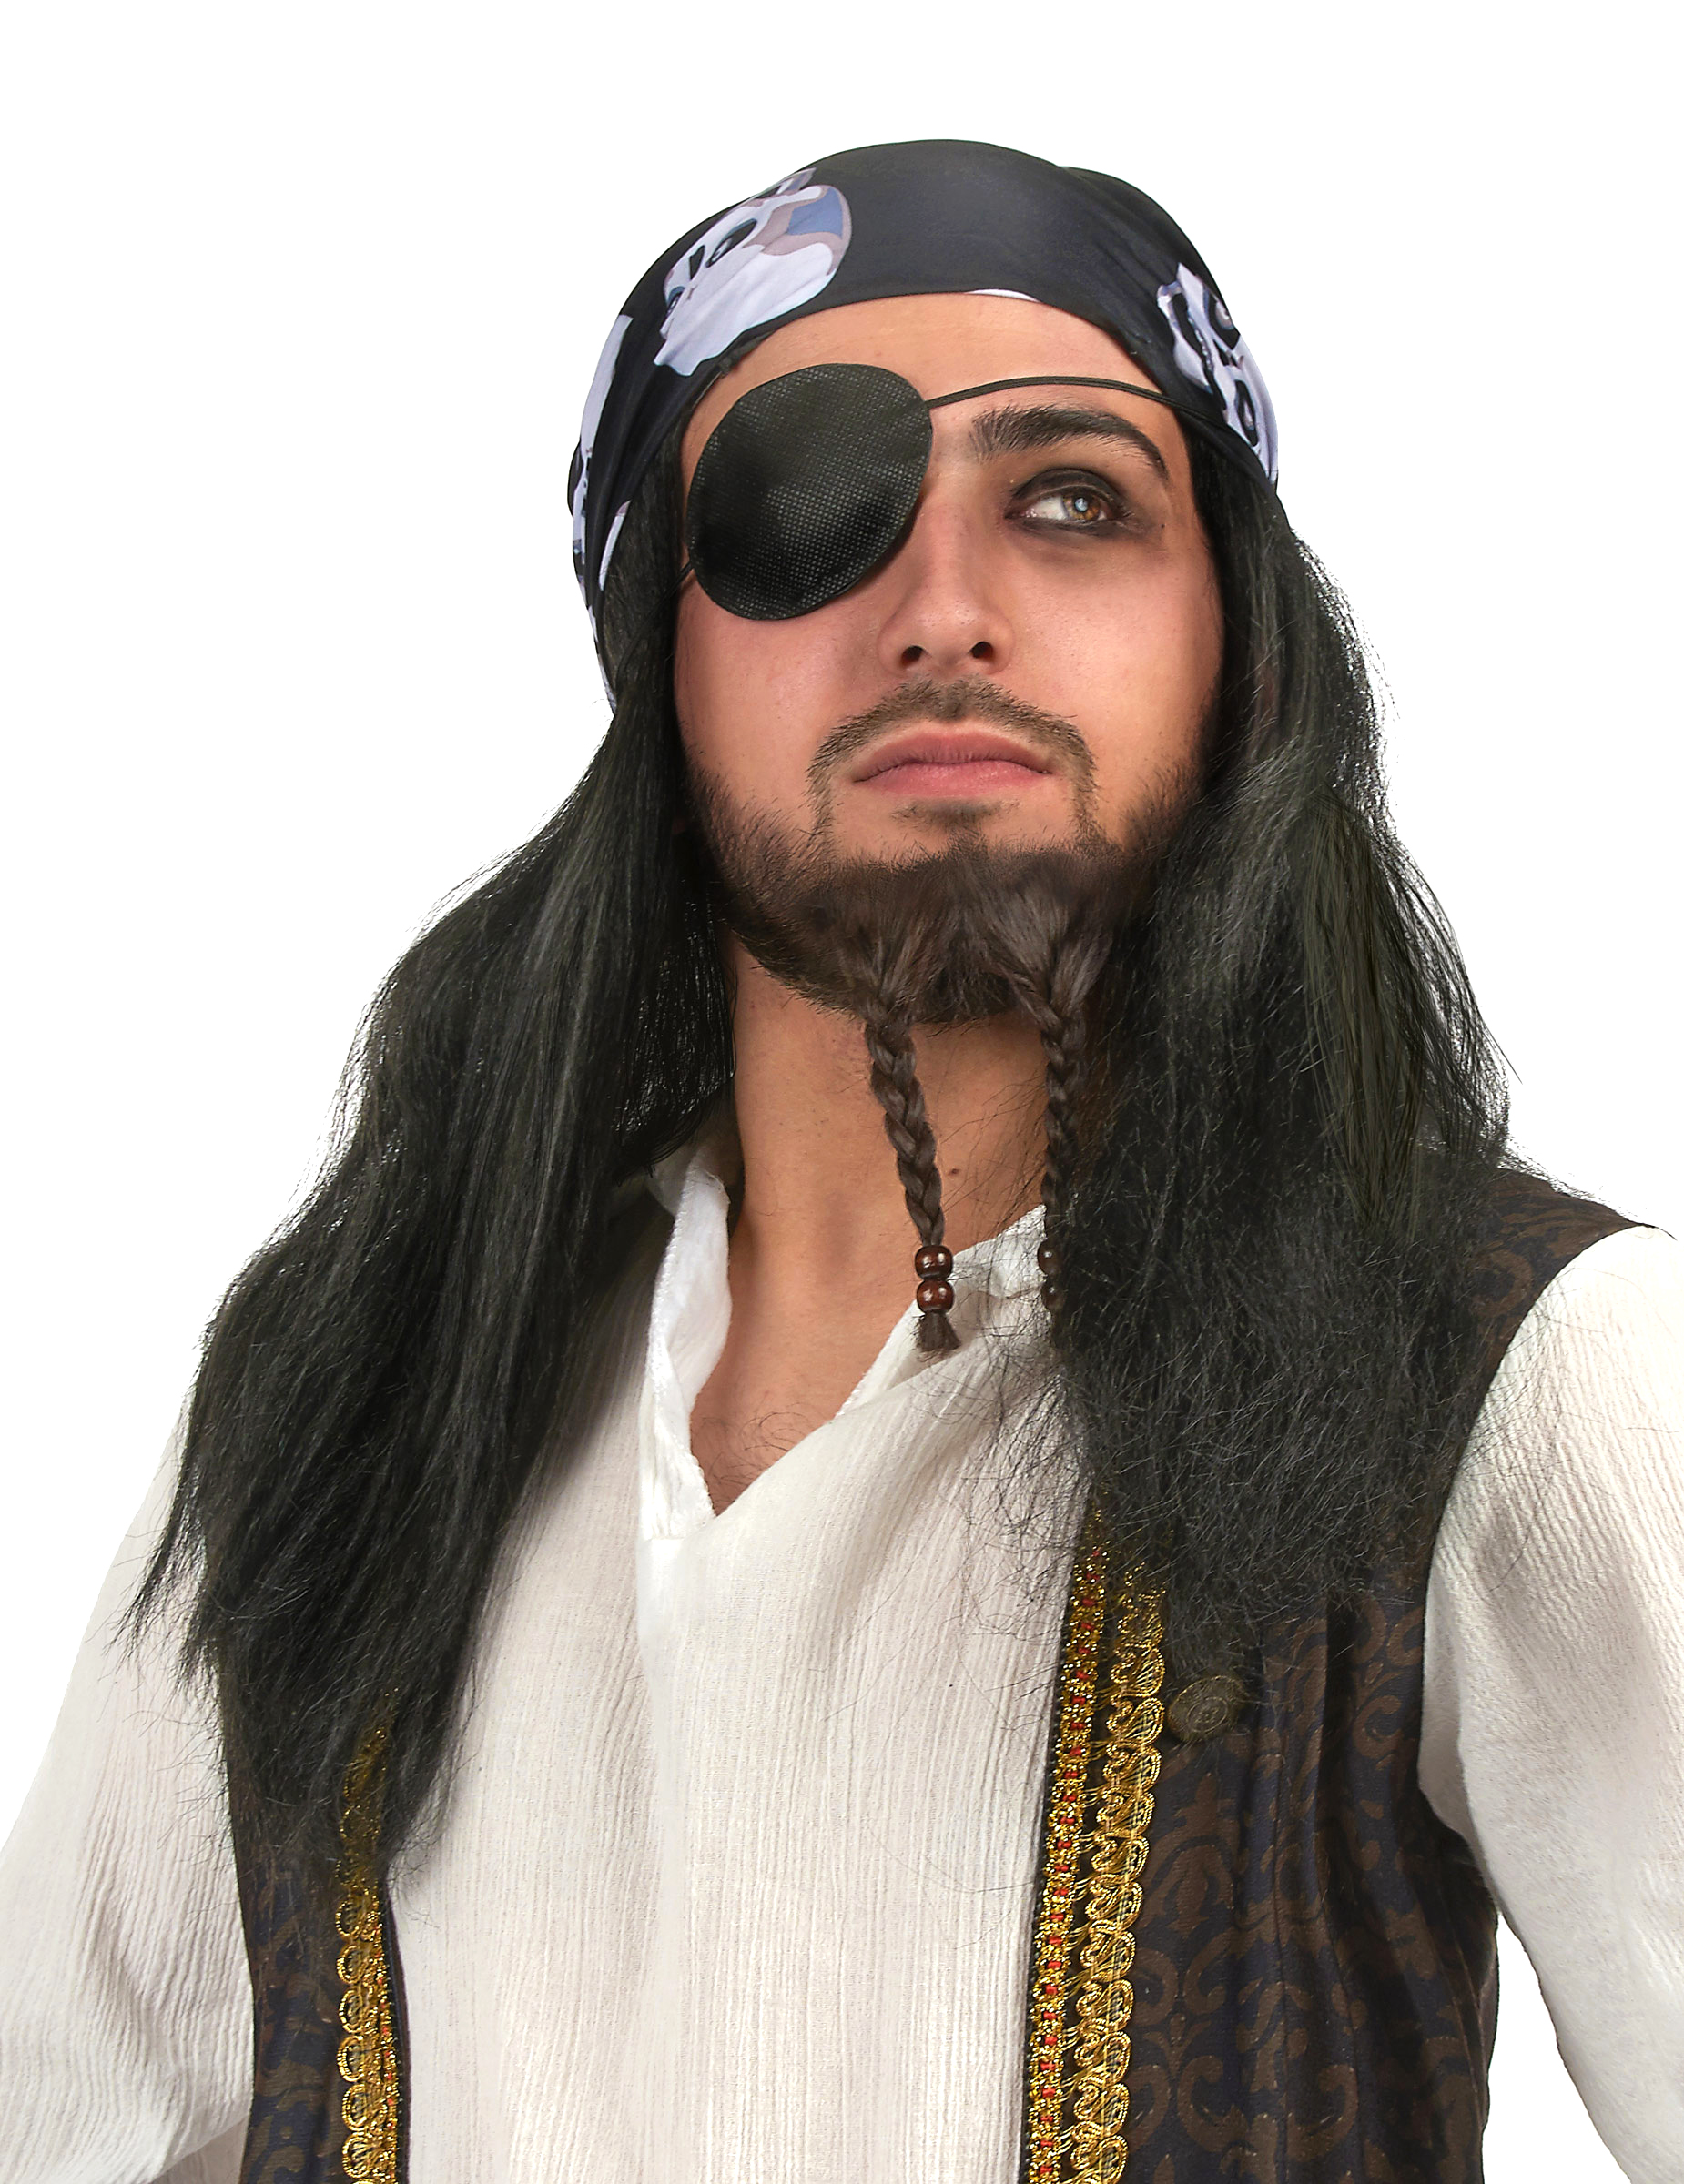 ad22ddf8392f Perruque pirate avec bandana tête de mort adulte   Deguise-toi ...